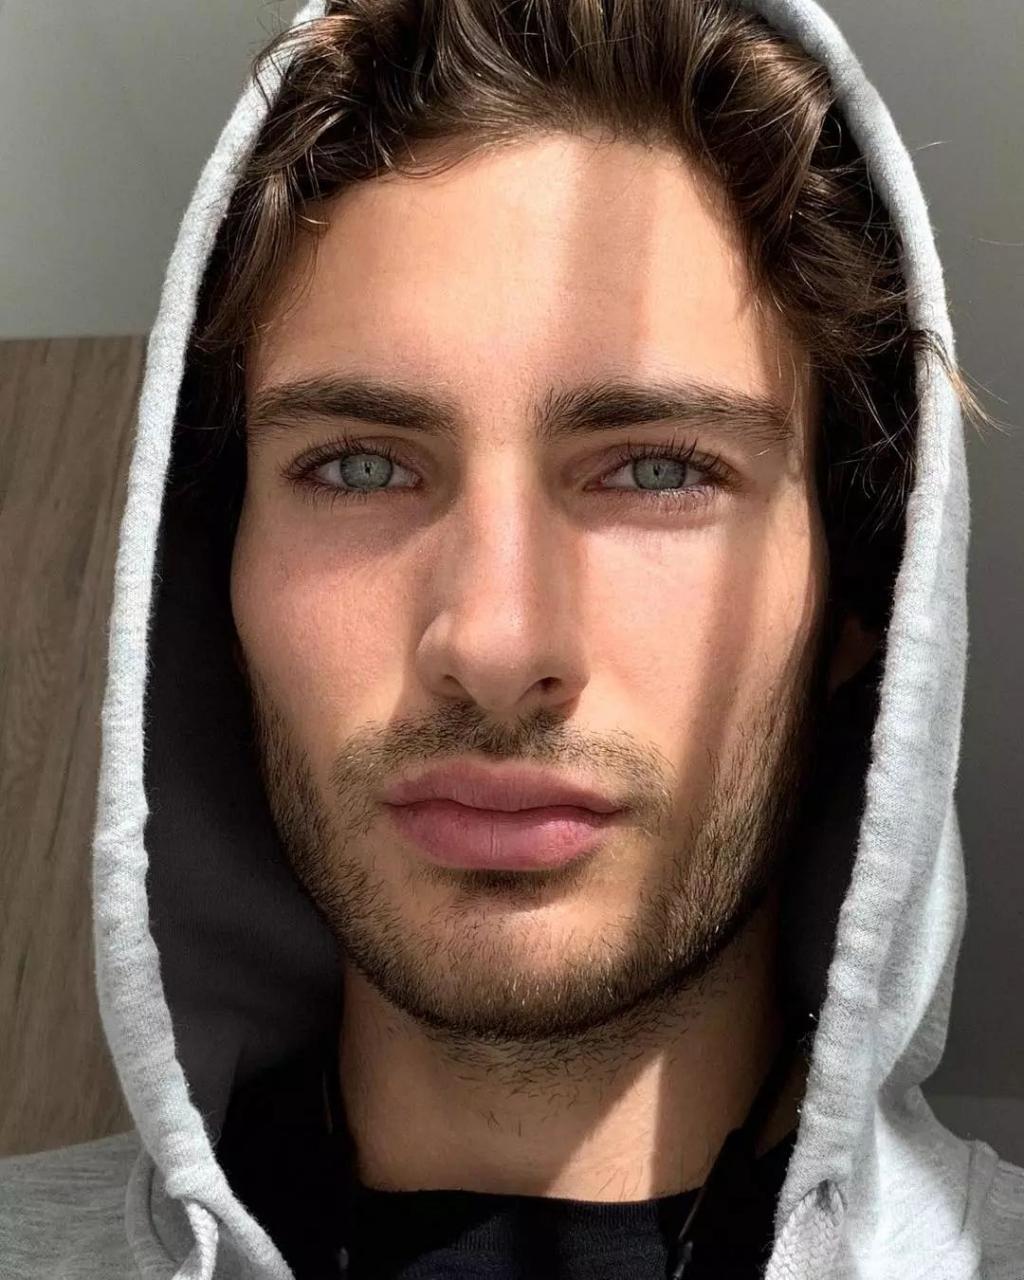 d3f4d81c9c734f72af937f200126b77f - 来自奥地利的男模Christoph Leitner成为了时装周的热门